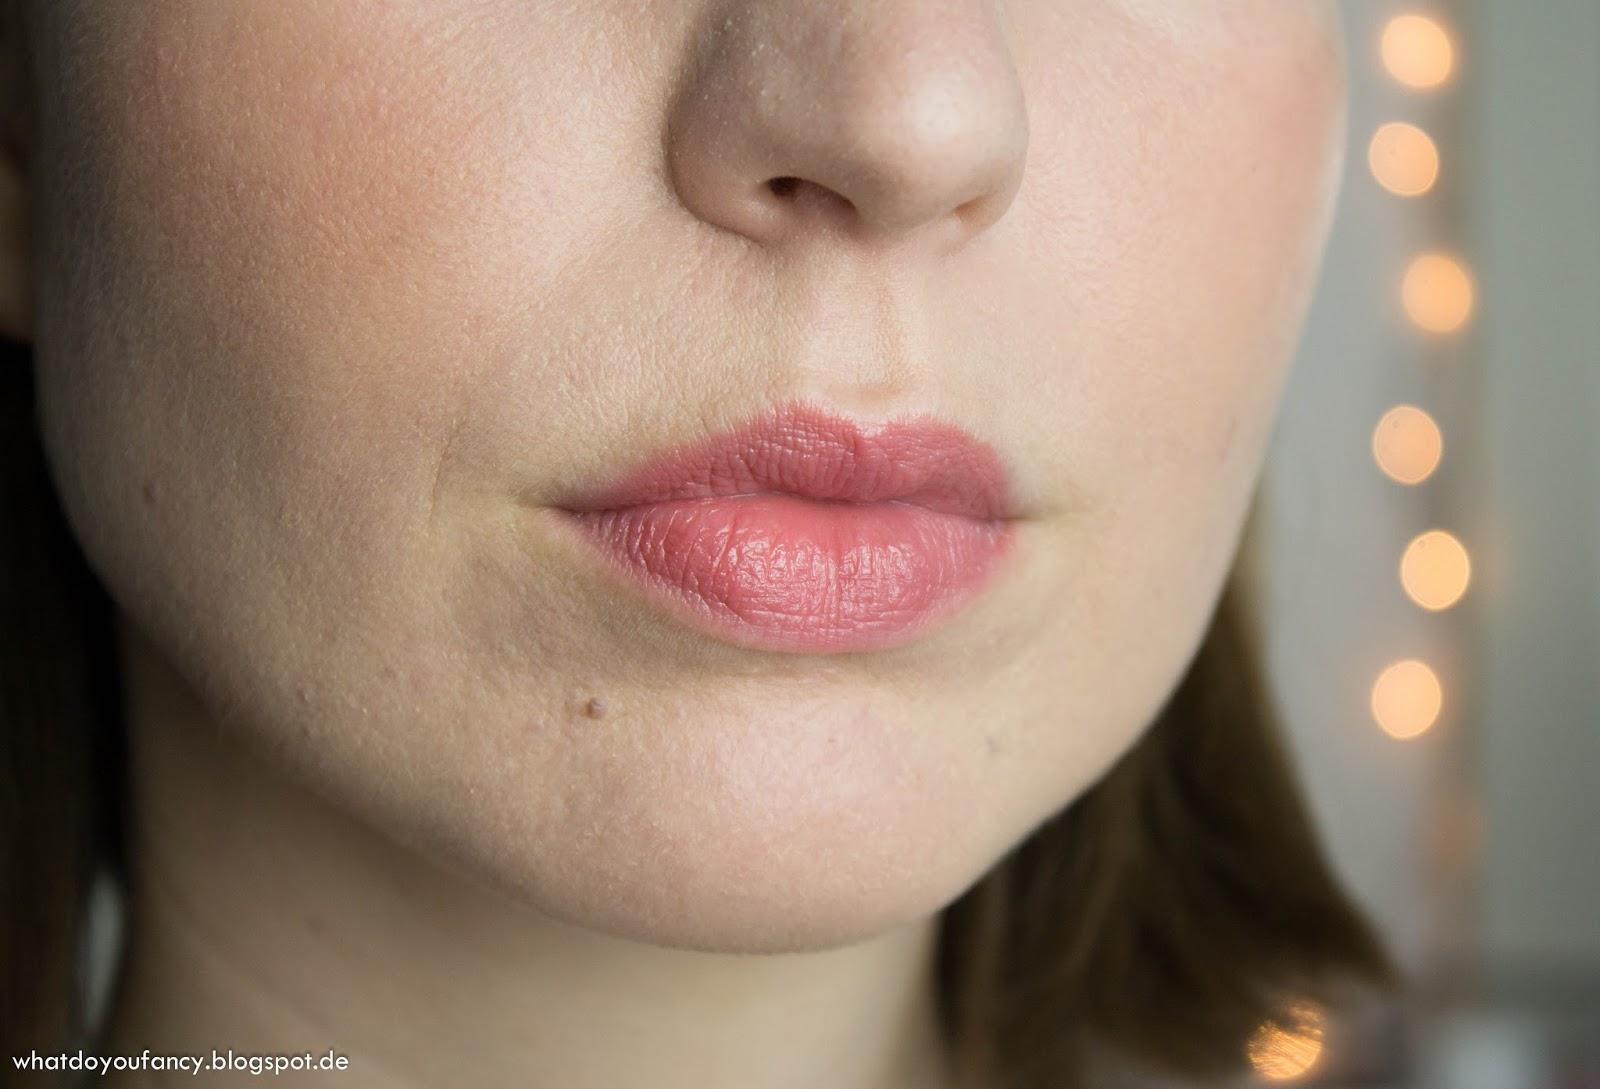 Clarins Rouge Prodige 107 Tea Rose – First Lipstick Love